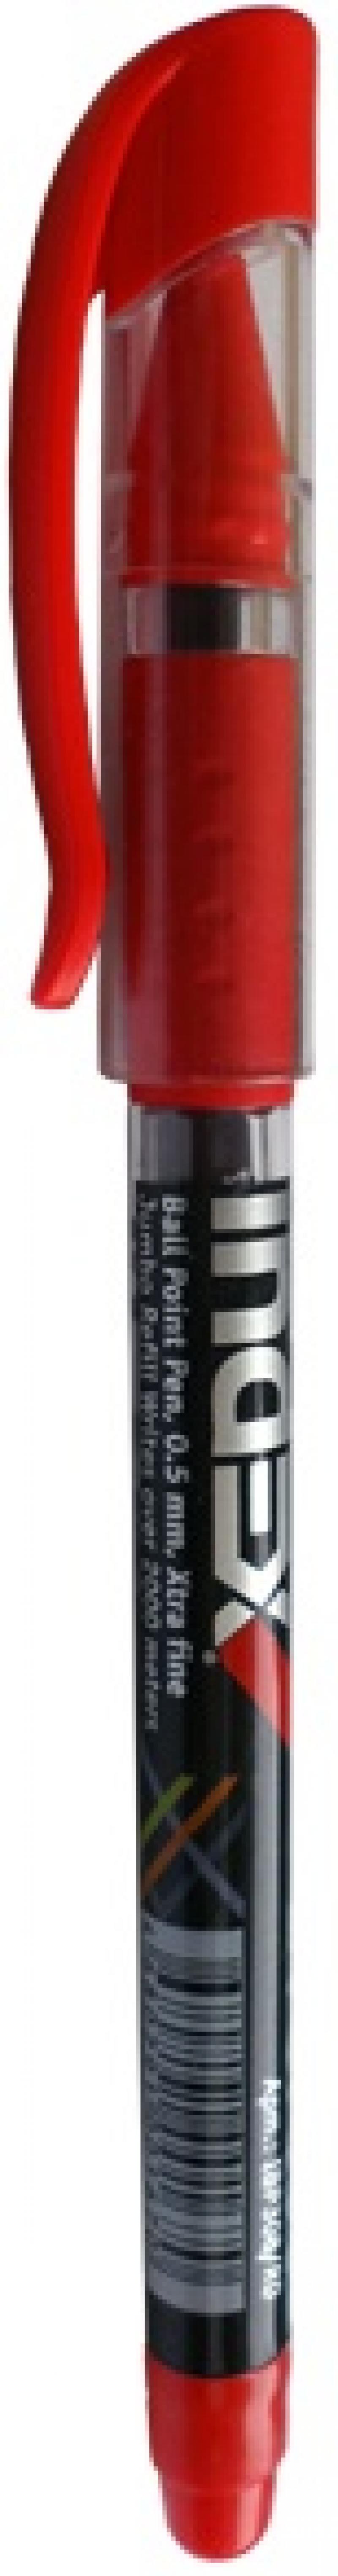 Шариковая ручка Index Everest красный 0.5 мм IBP308/RD IBP308/RD grance grance rd 02